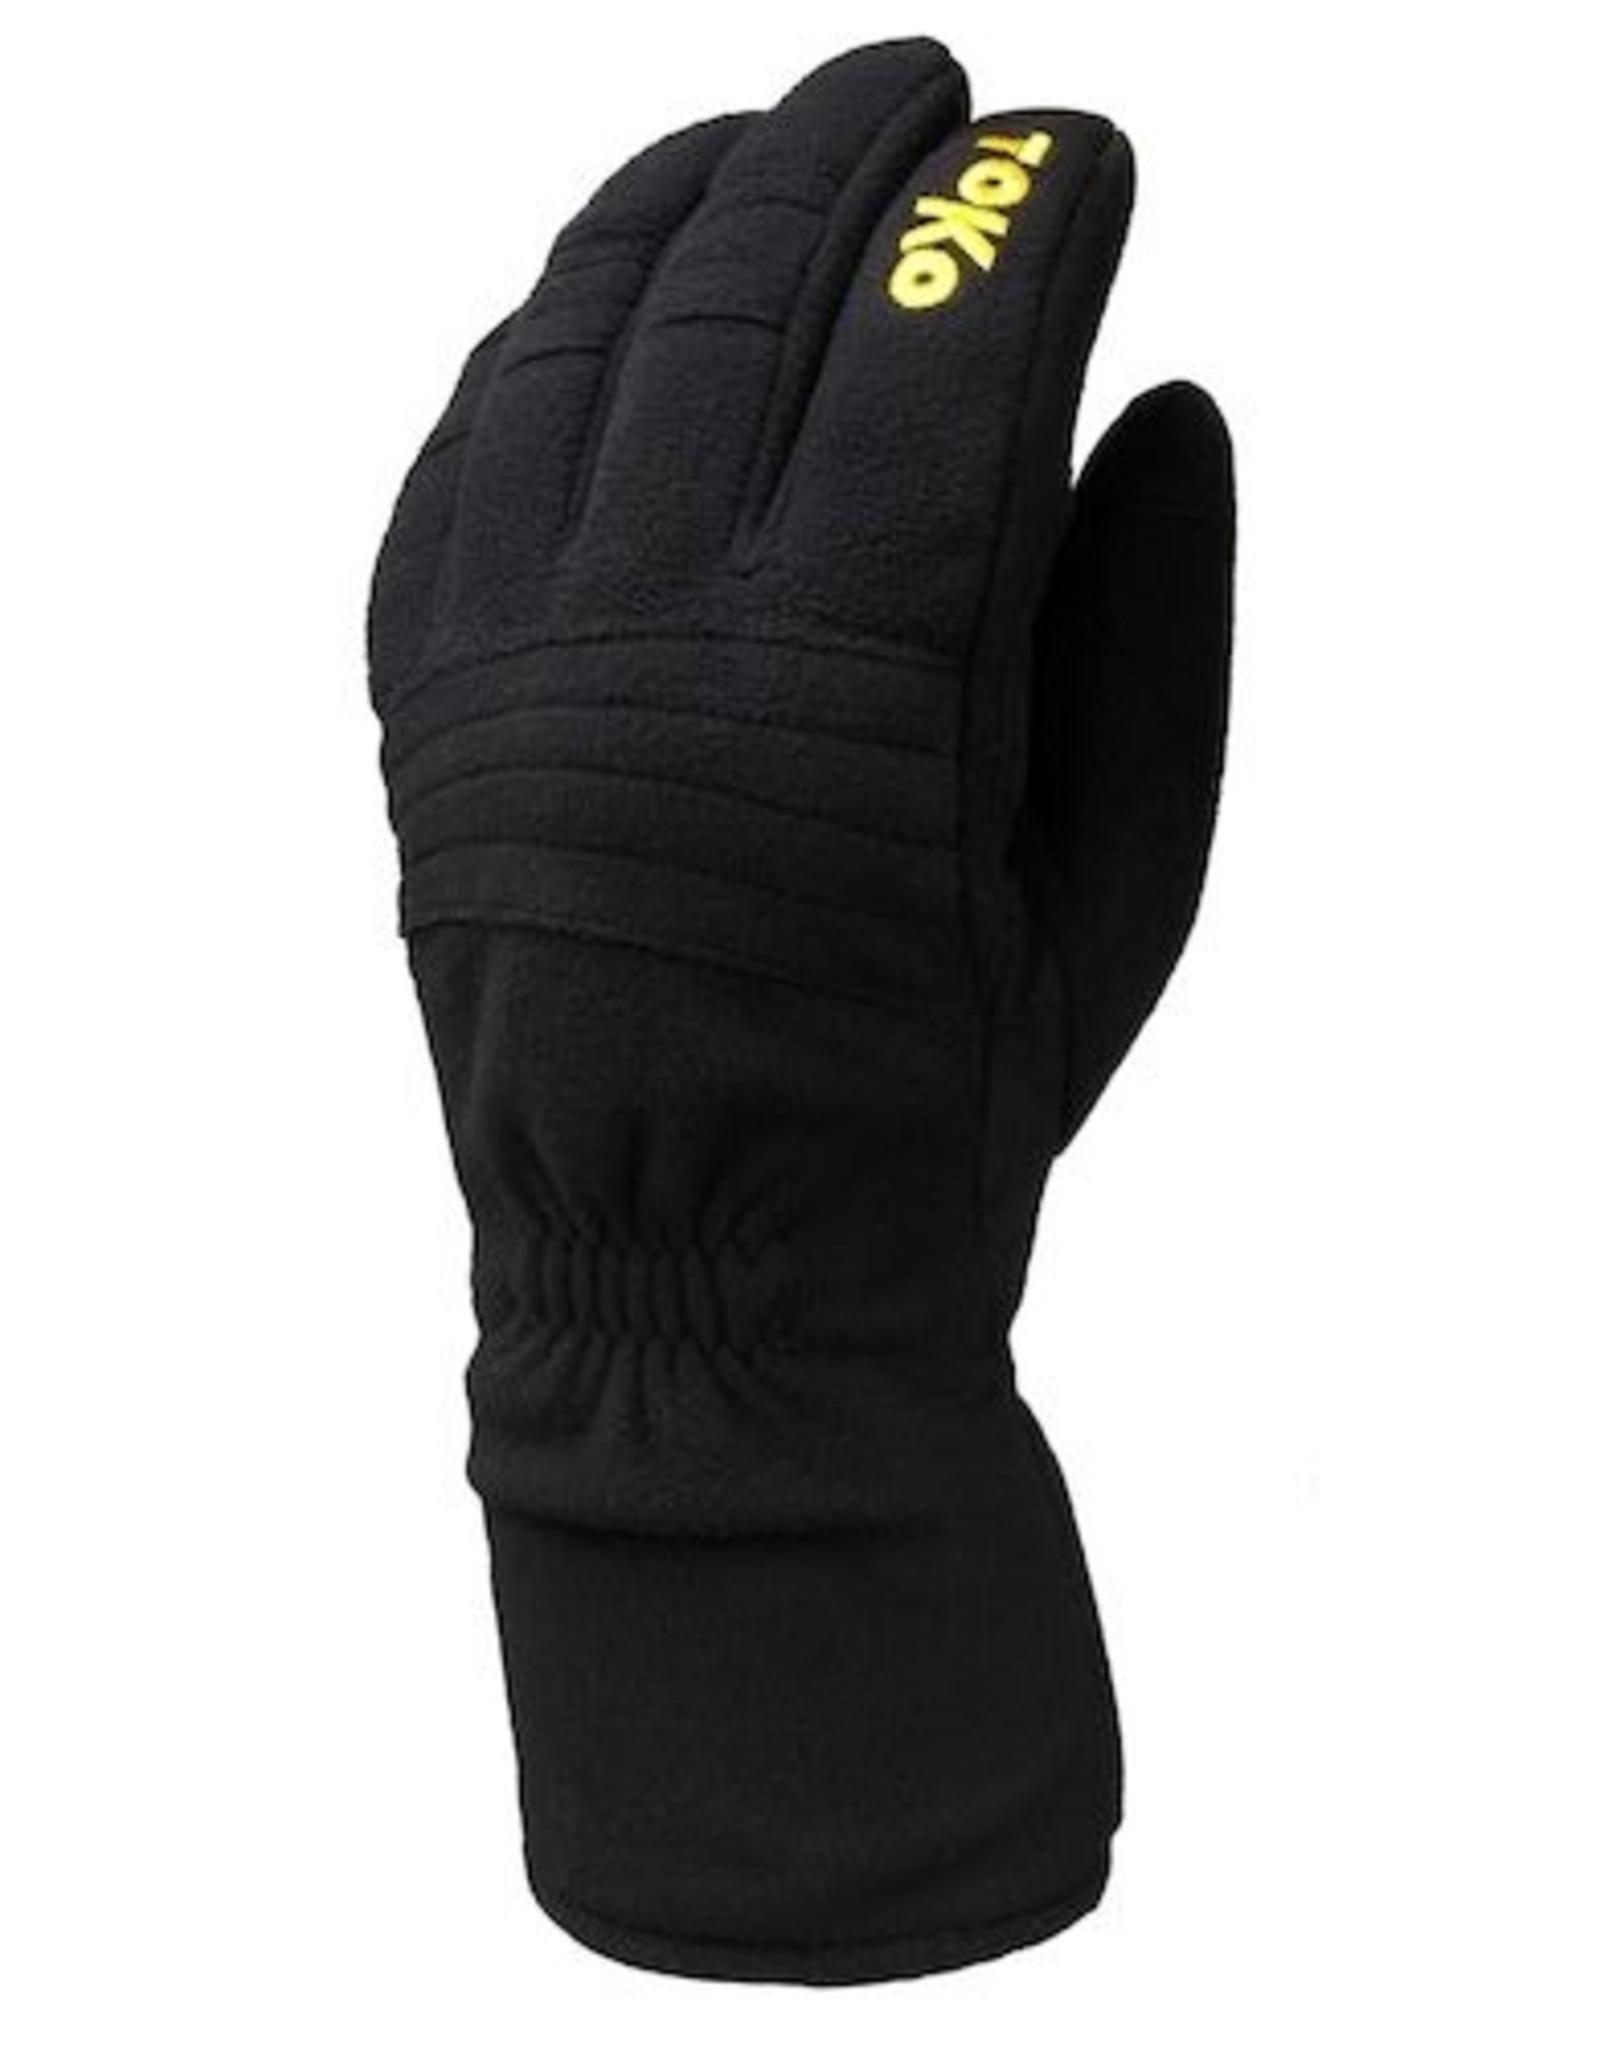 Toko Thermo Fleece Glove